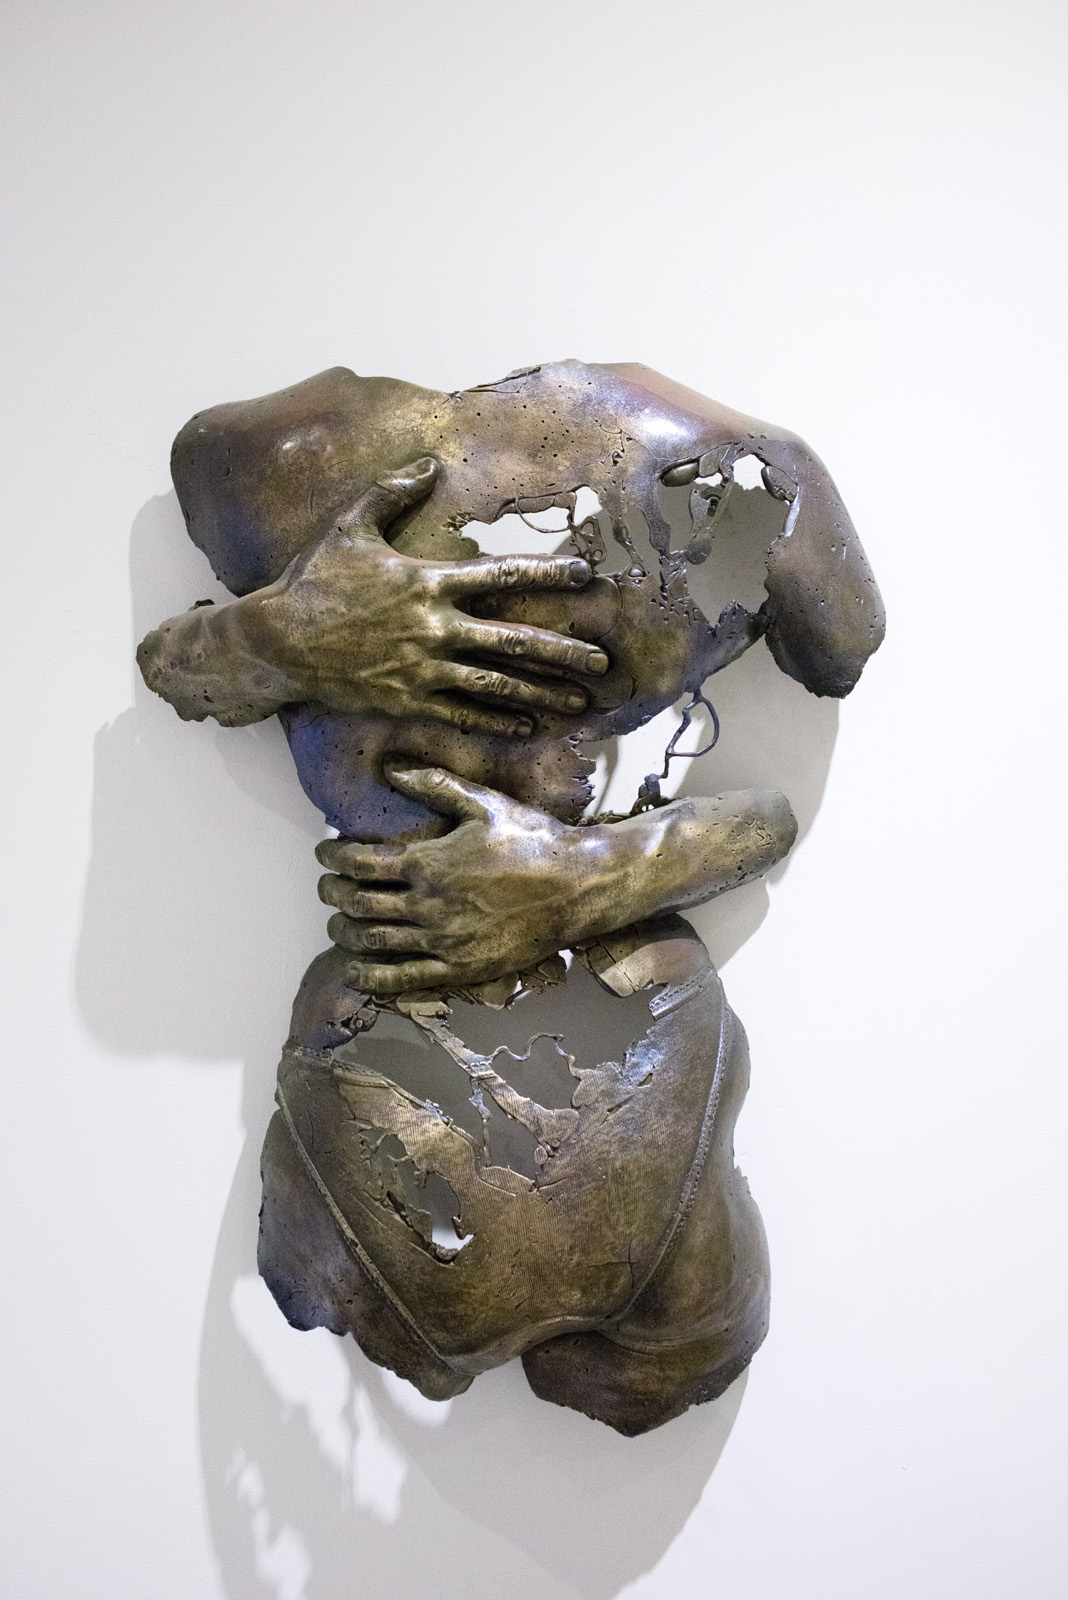 "The Hug, 1997, bronze with patina, 24"" x 7"" x 5""."